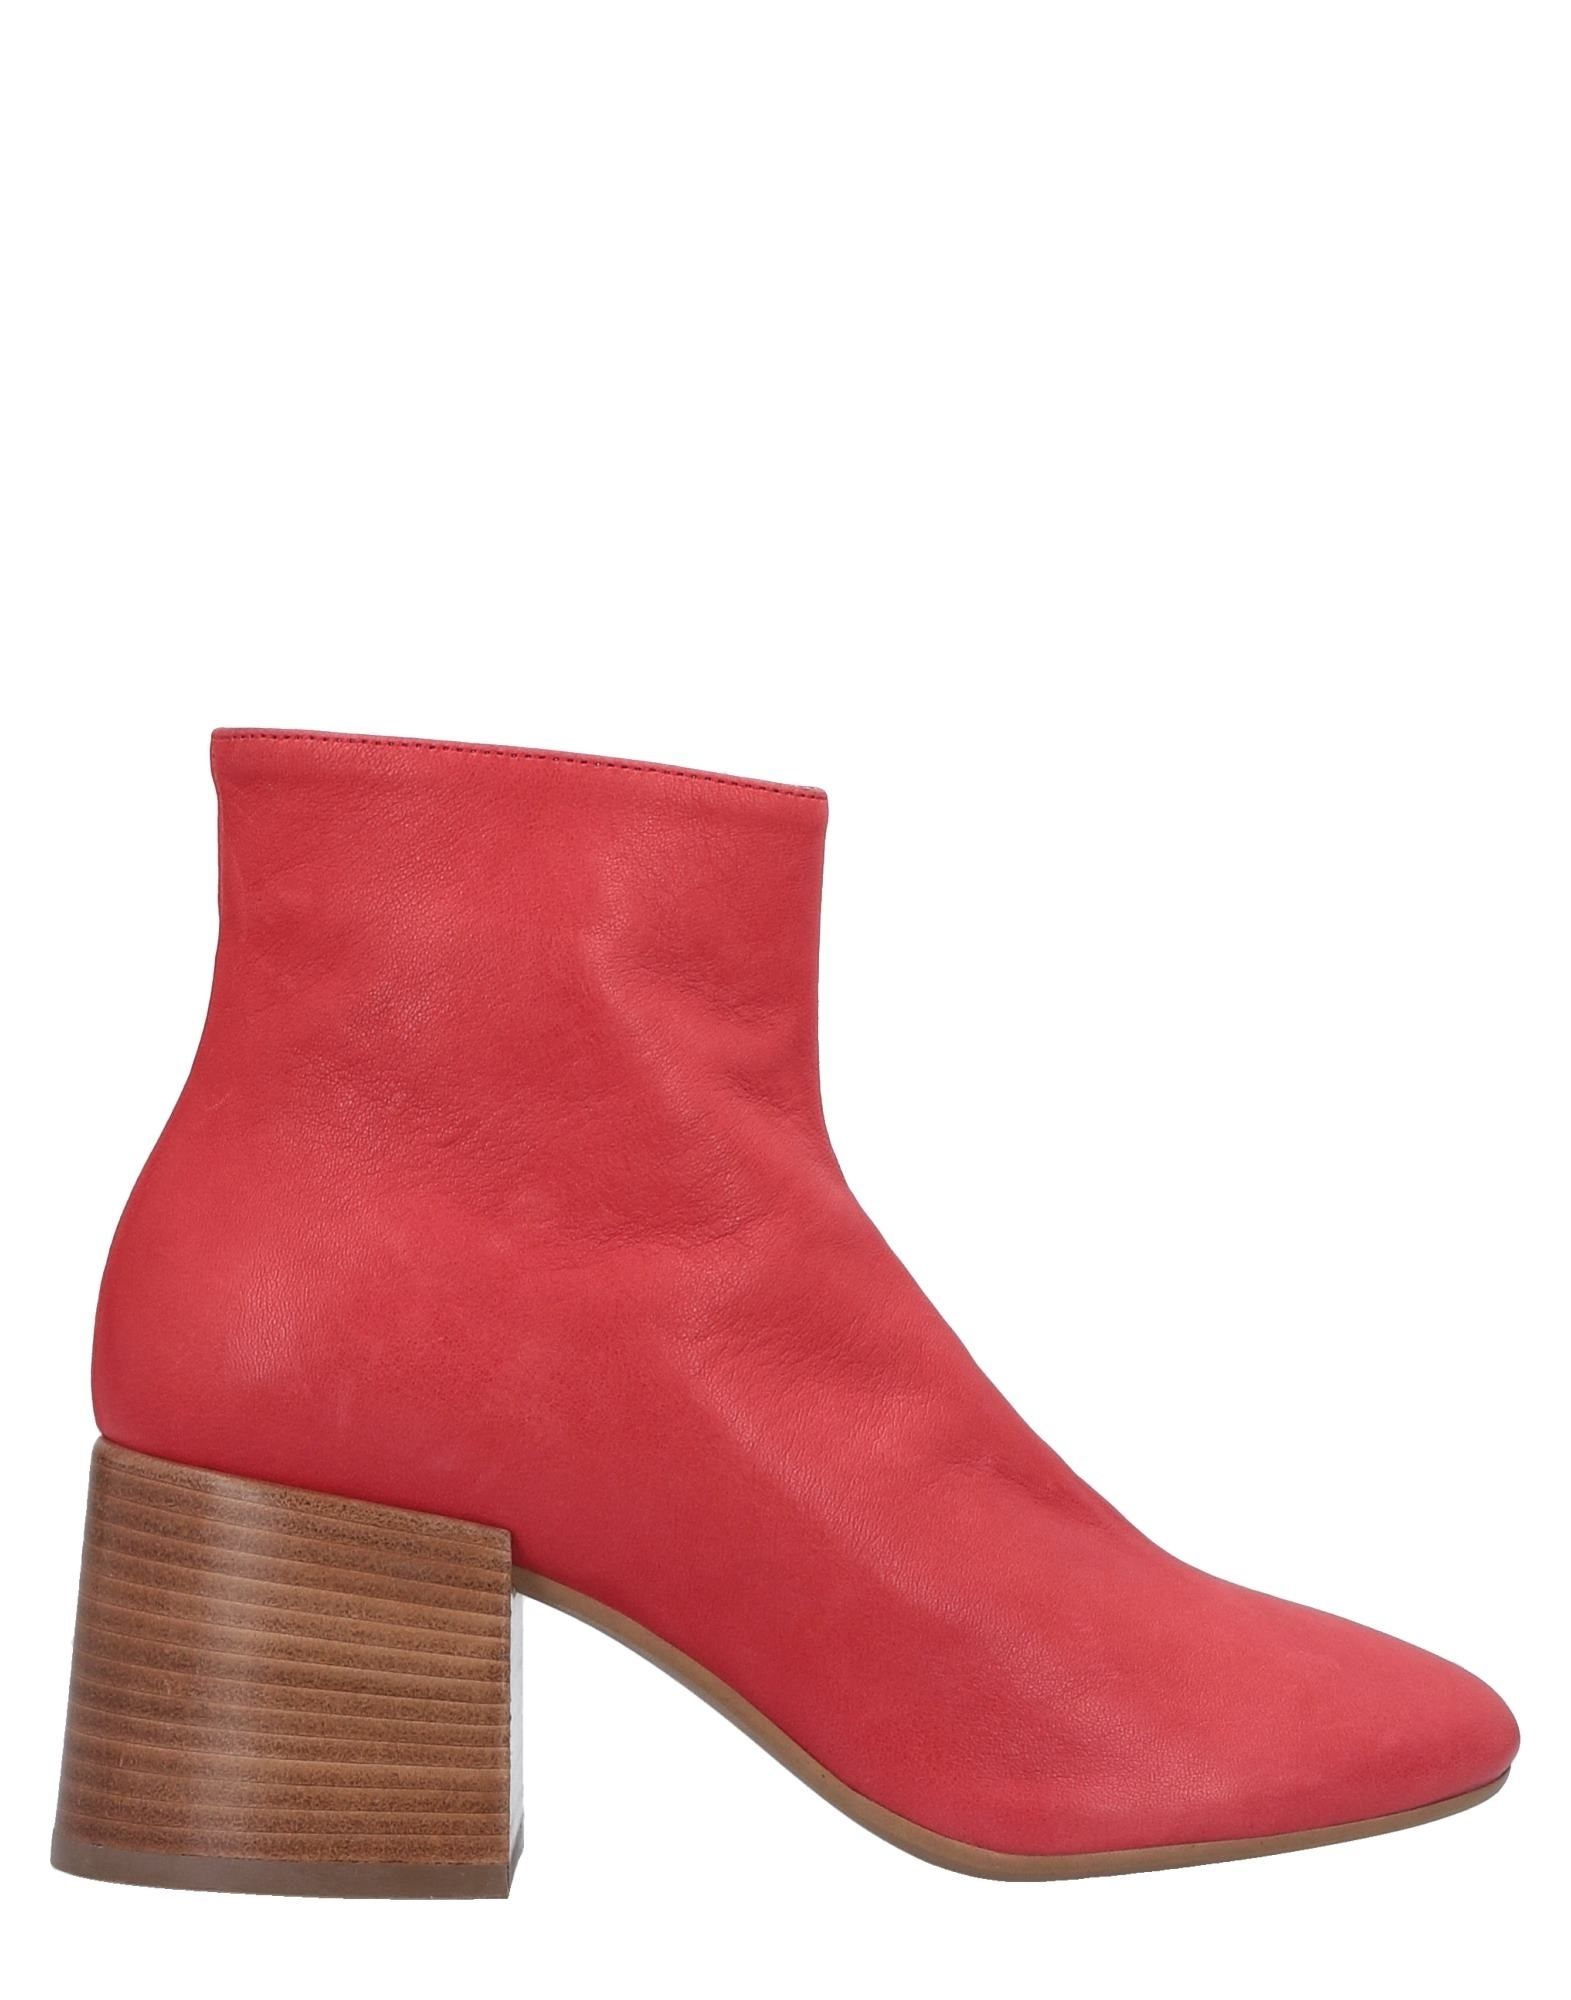 Coral Botín Mm6 Maison Margiela Mujer - - - Botines Mm6 Maison Margiela Zapatos de mujer baratos zapatos de mujer 278922